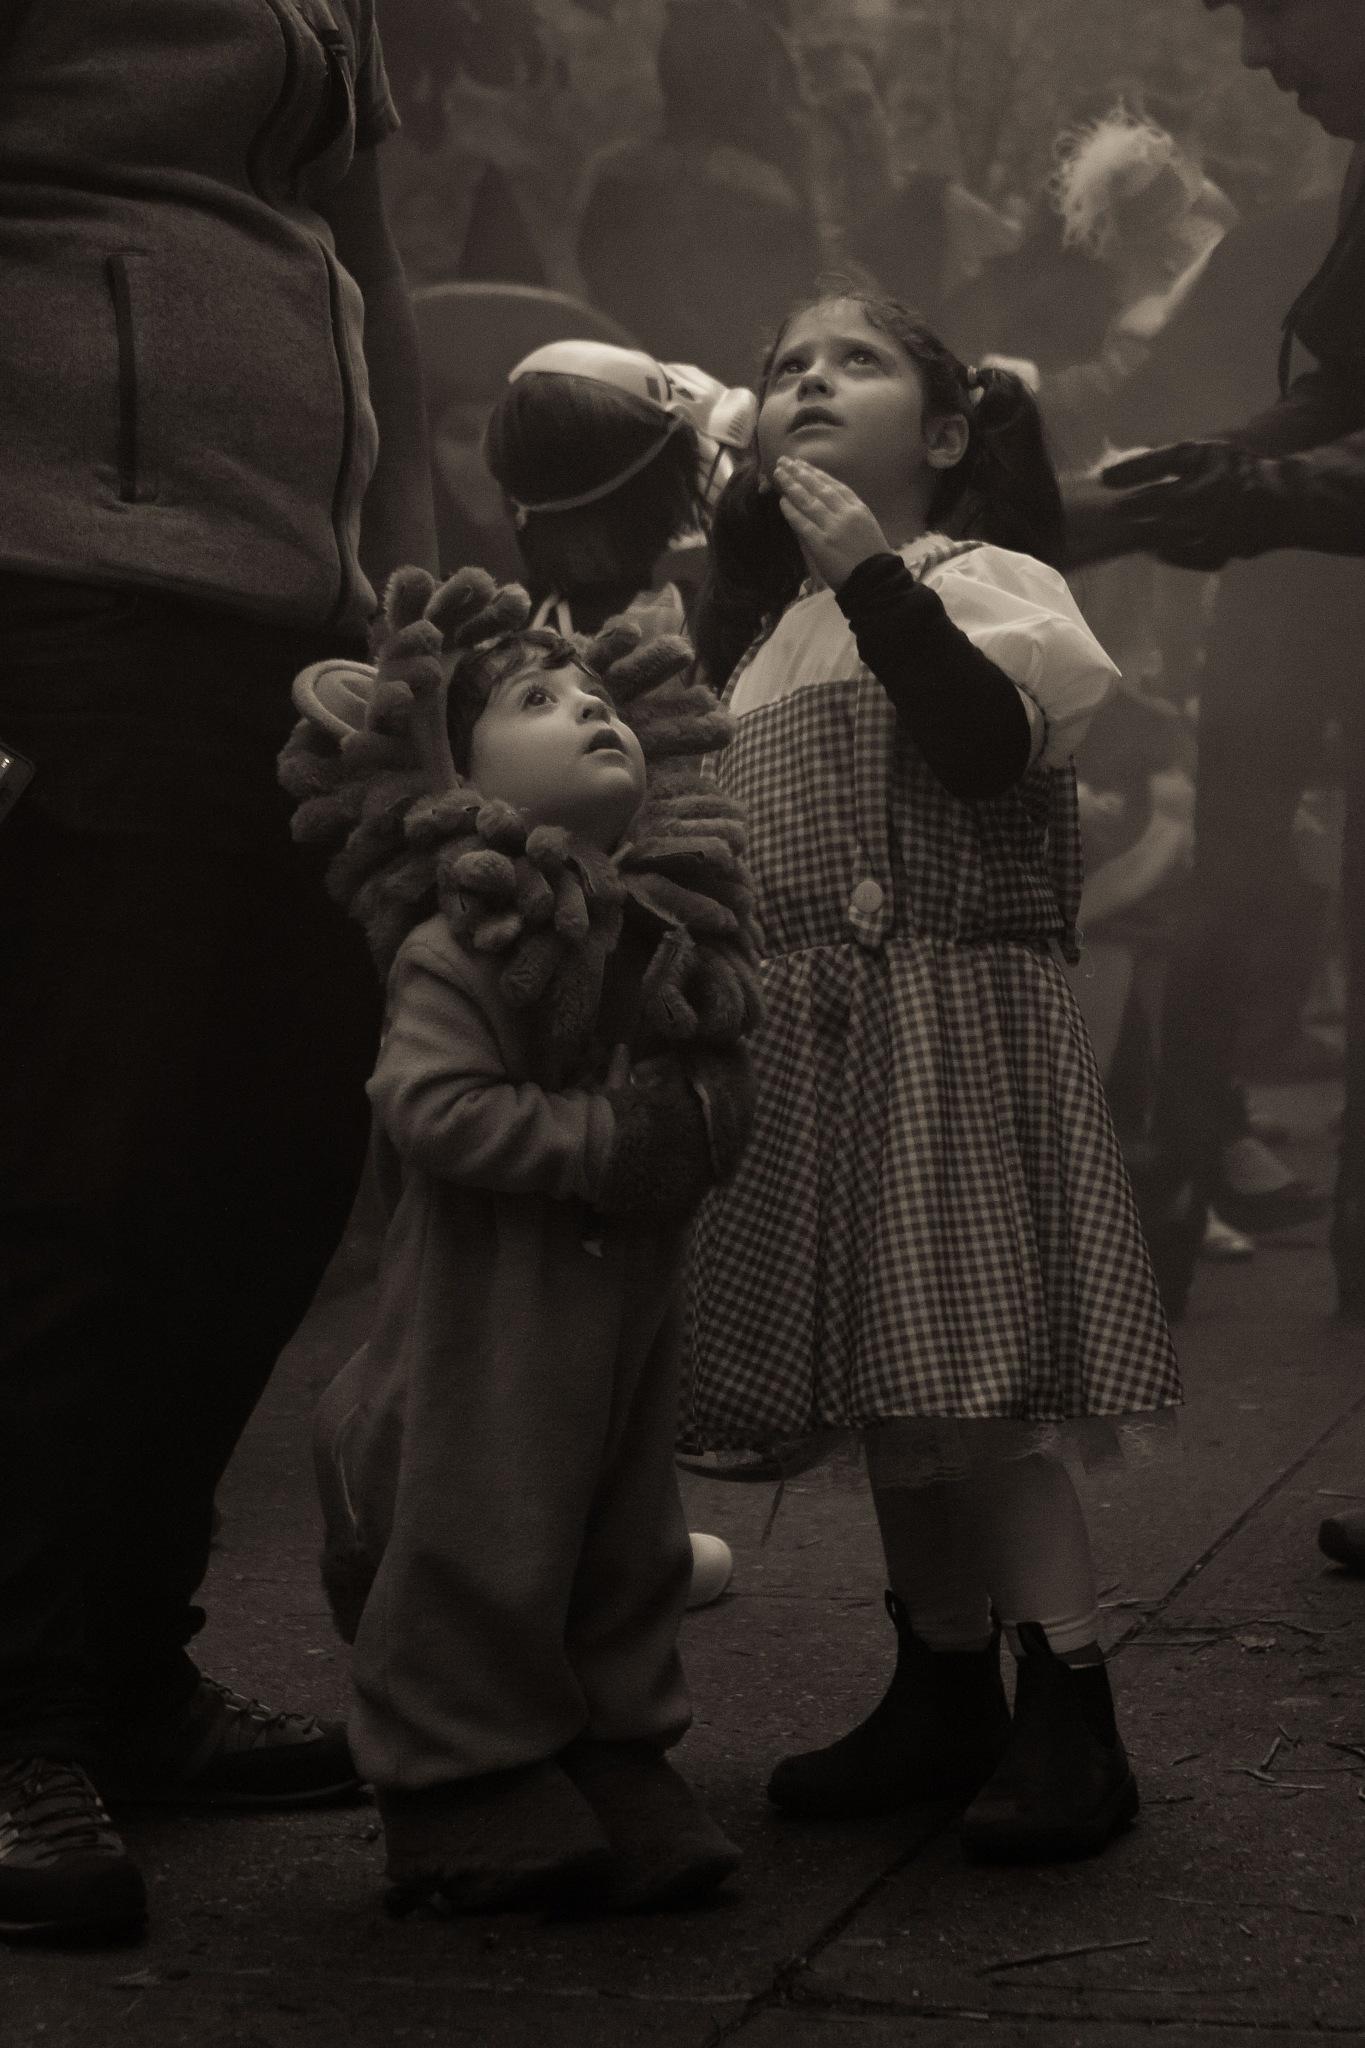 Halloween Surprise - NYC © Copyright 2017, Verne Varona by VerneVarona